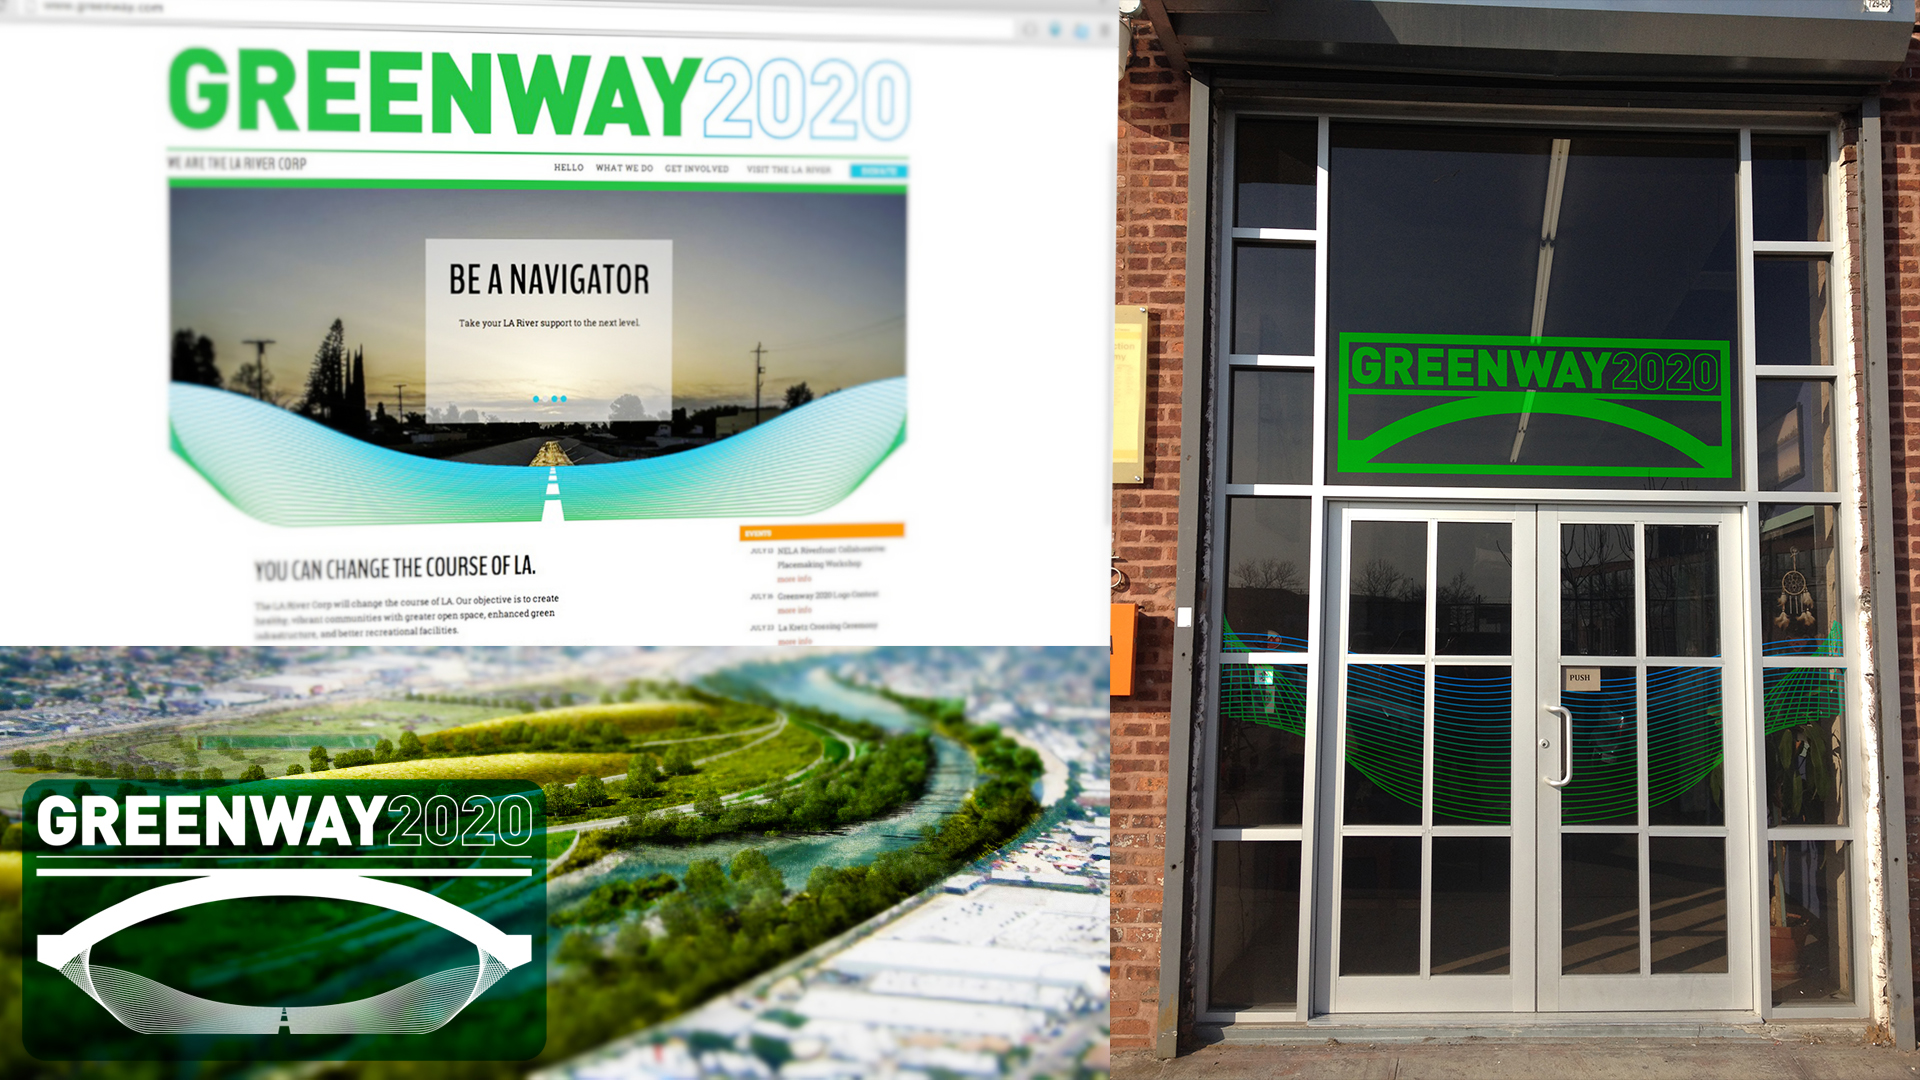 greenway_2.jpg